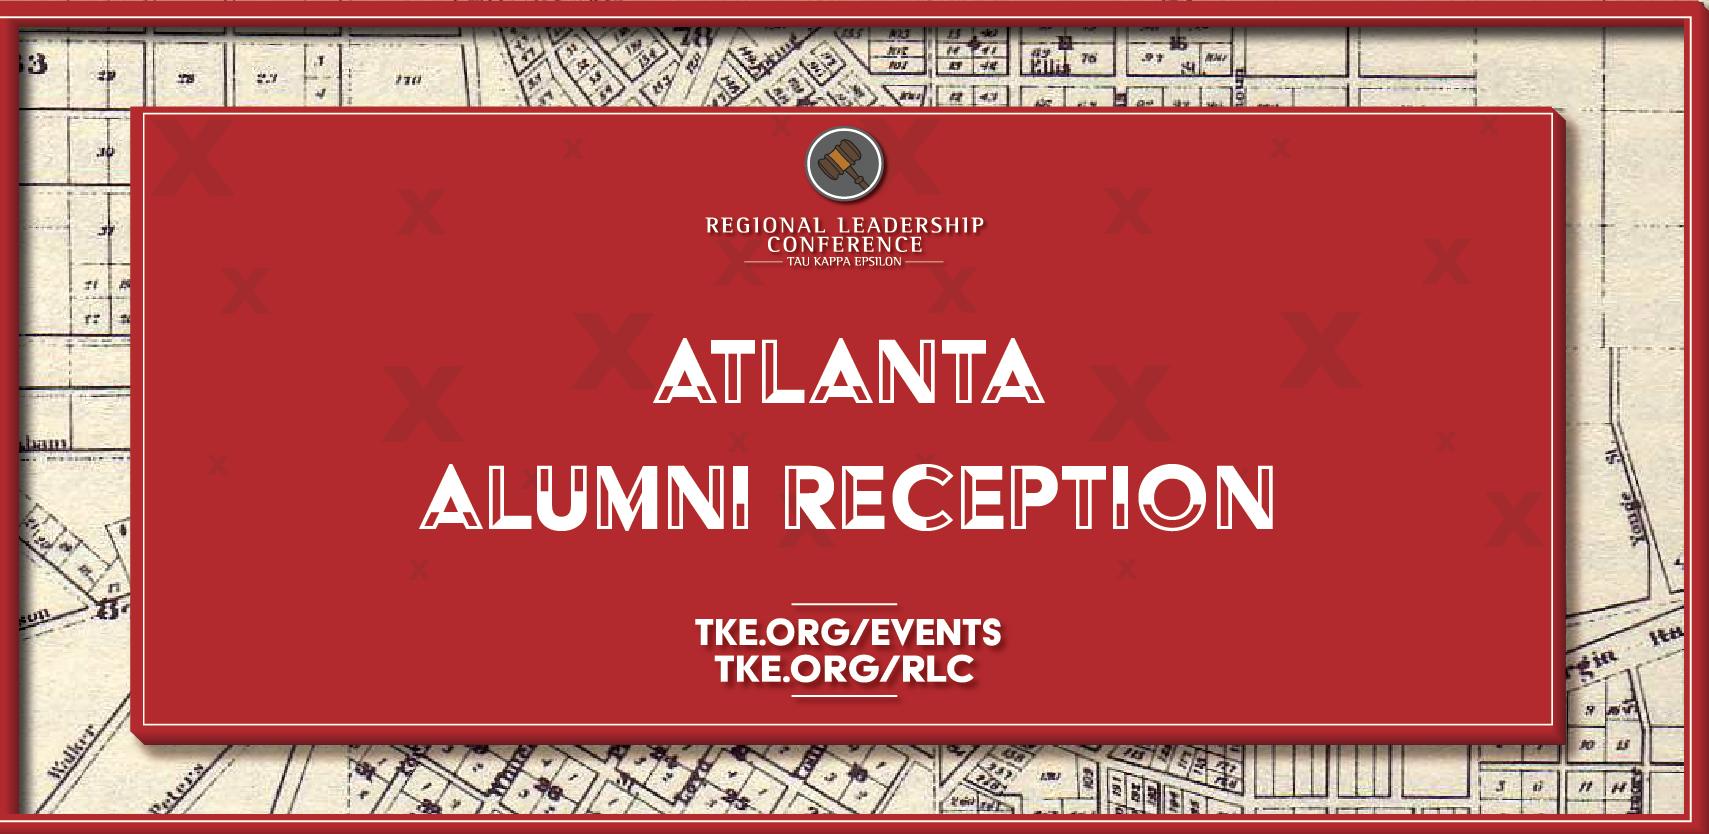 Atlanta Alumni Reception